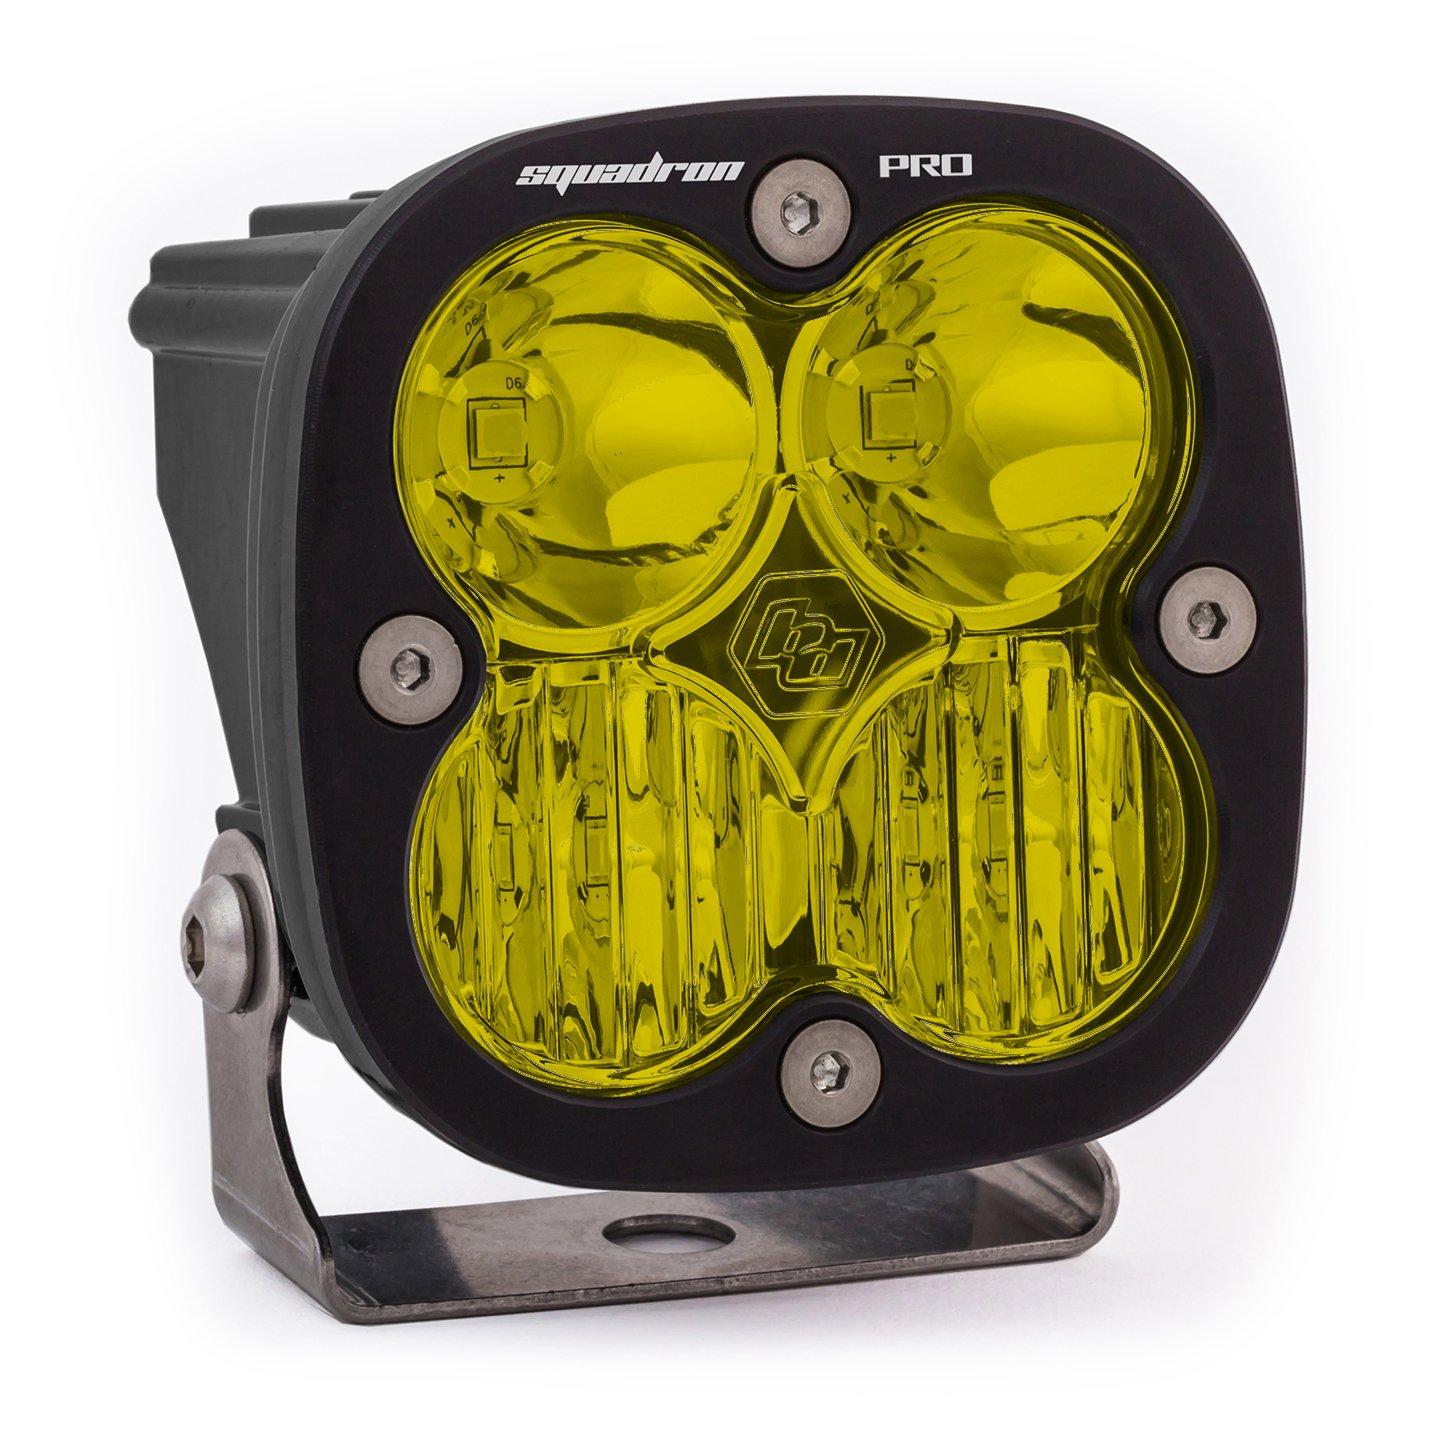 Winder Lamp Blender Baja Designs BAJ490013 Amber Watch